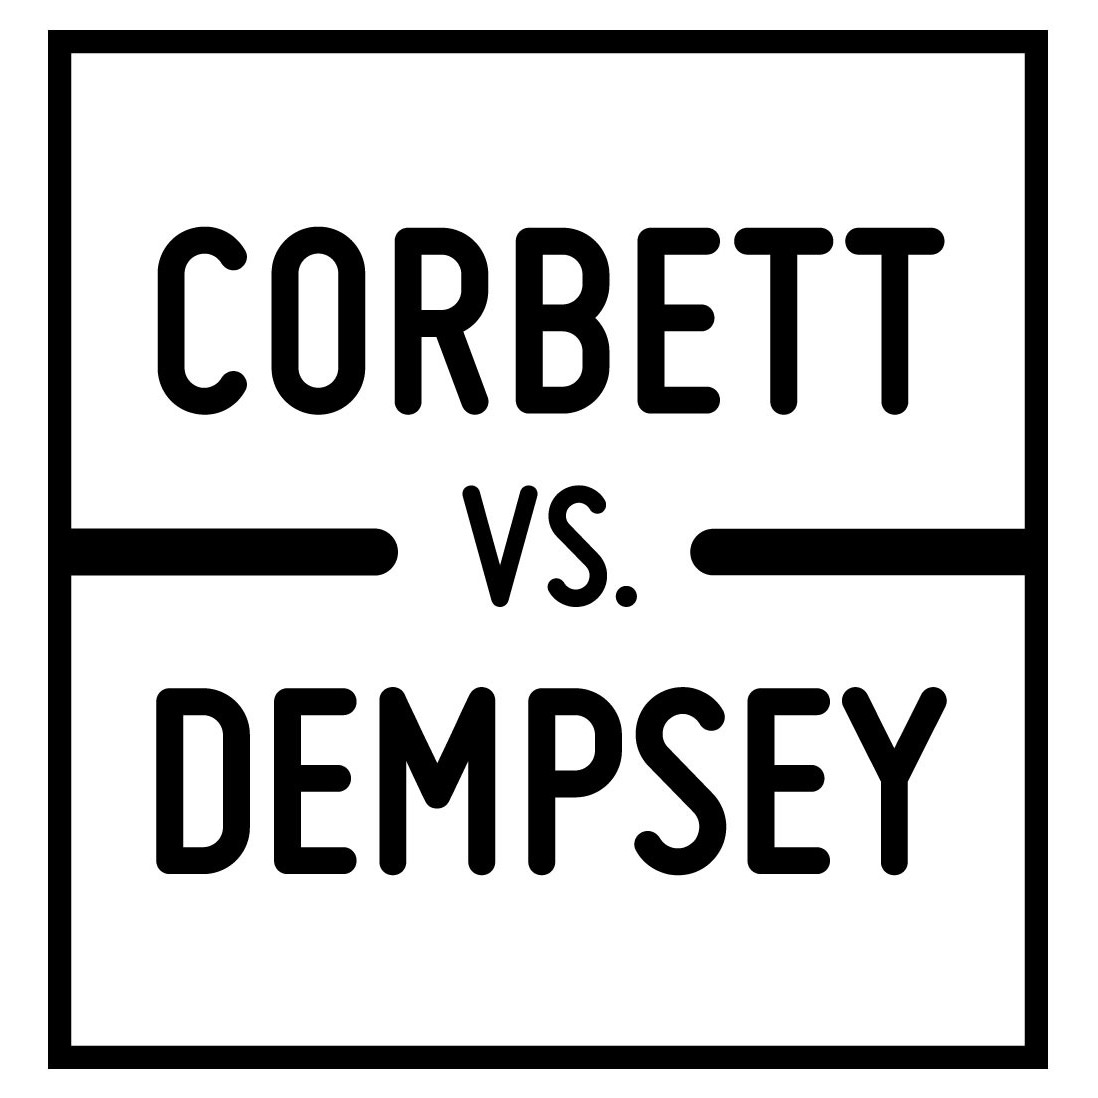 「CORBETT VS. DEMPSEY」の画像検索結果